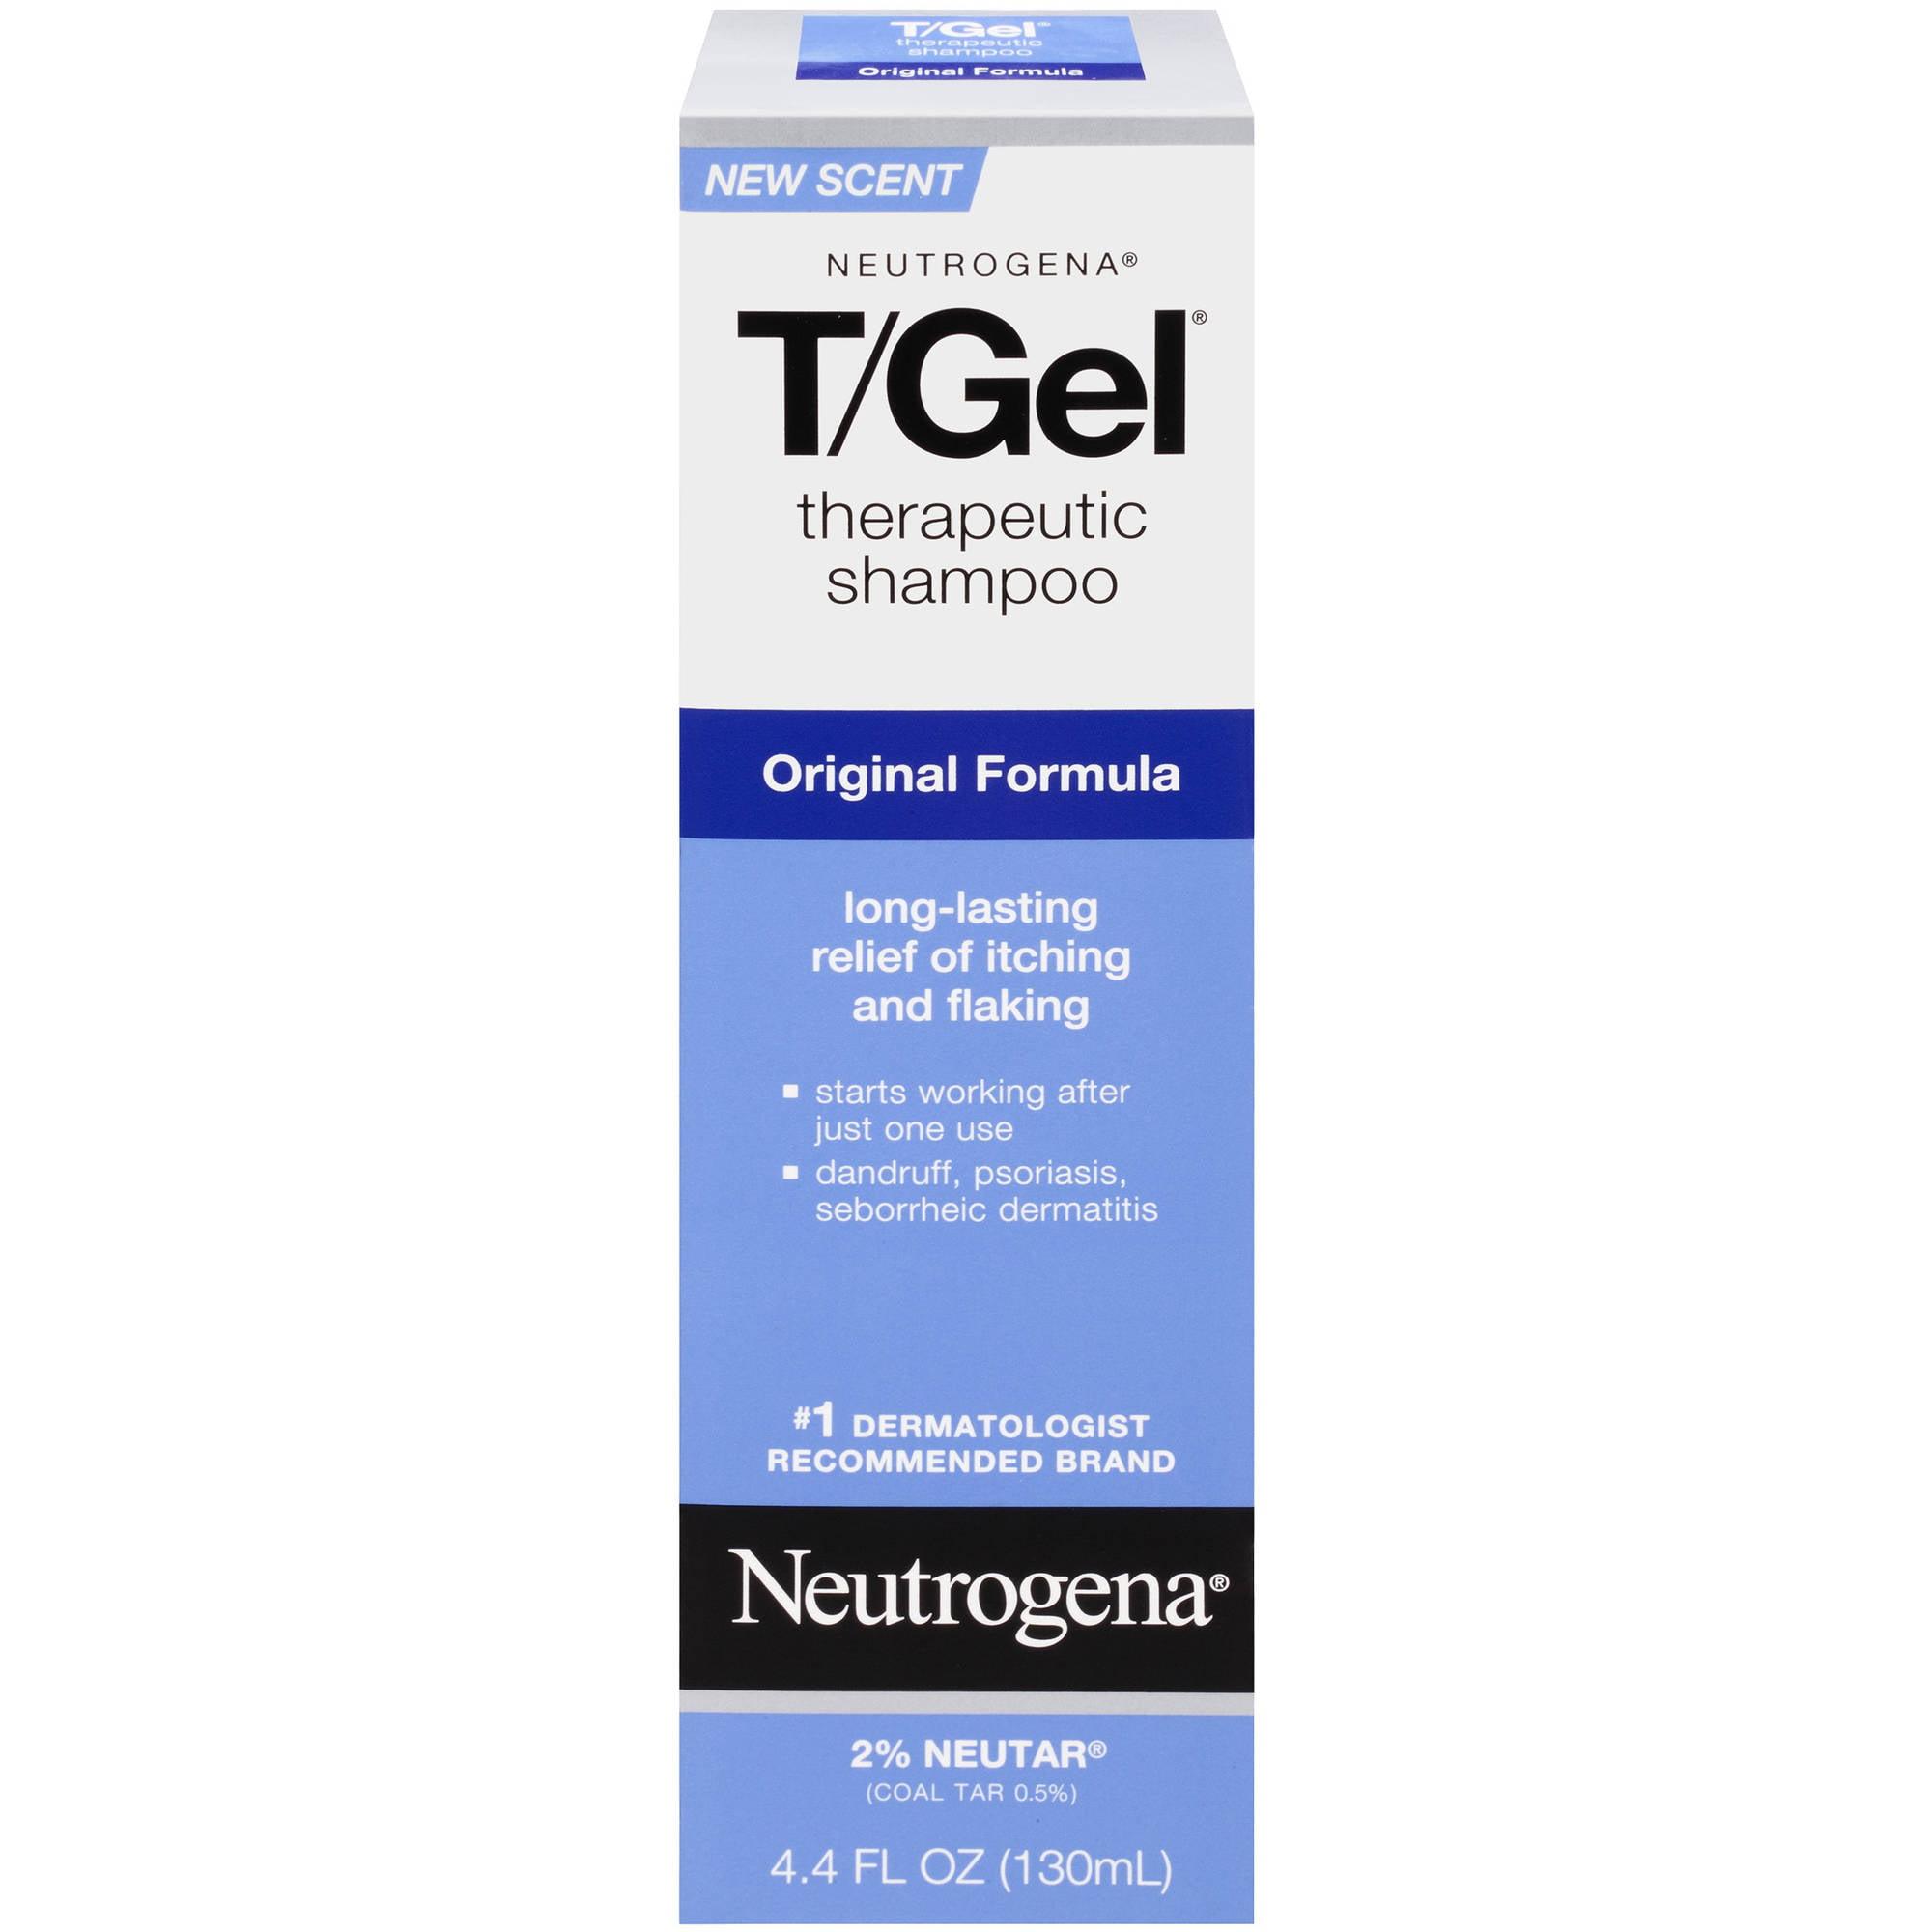 Neutrogena T/Gel Original Formula Therapeutic Shampoo 4.4 Oz